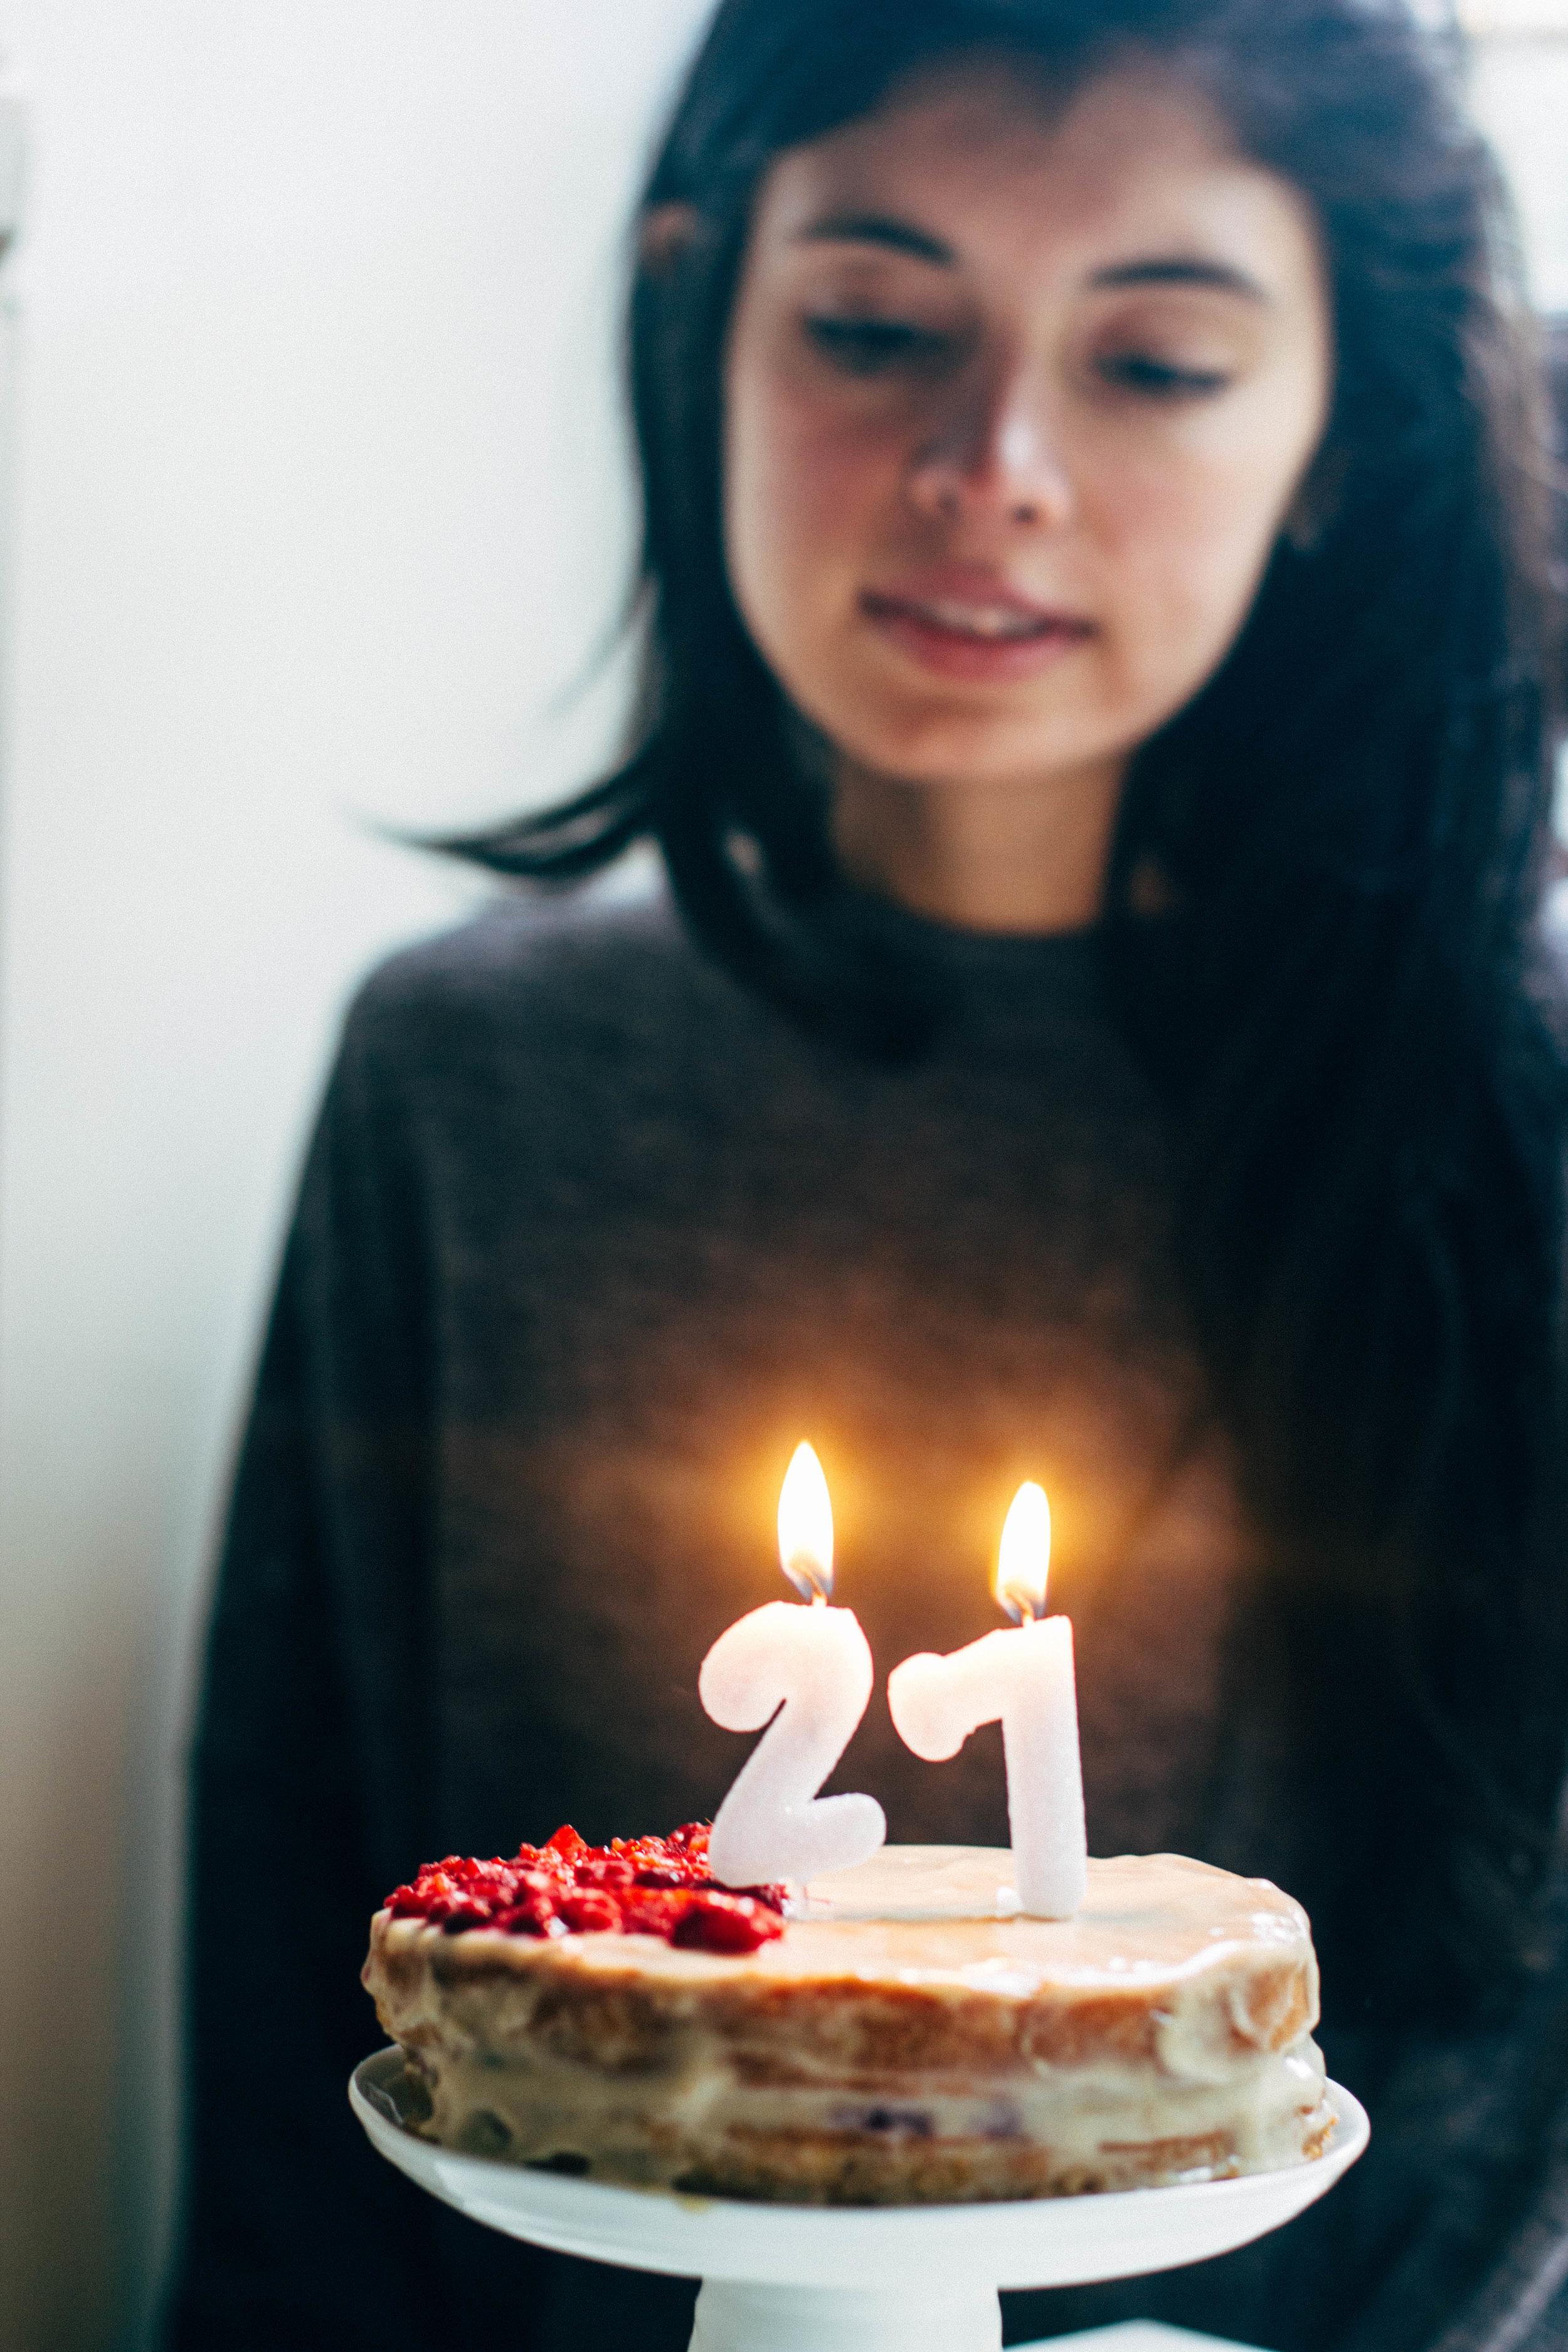 layla-21st-1-1.jpg